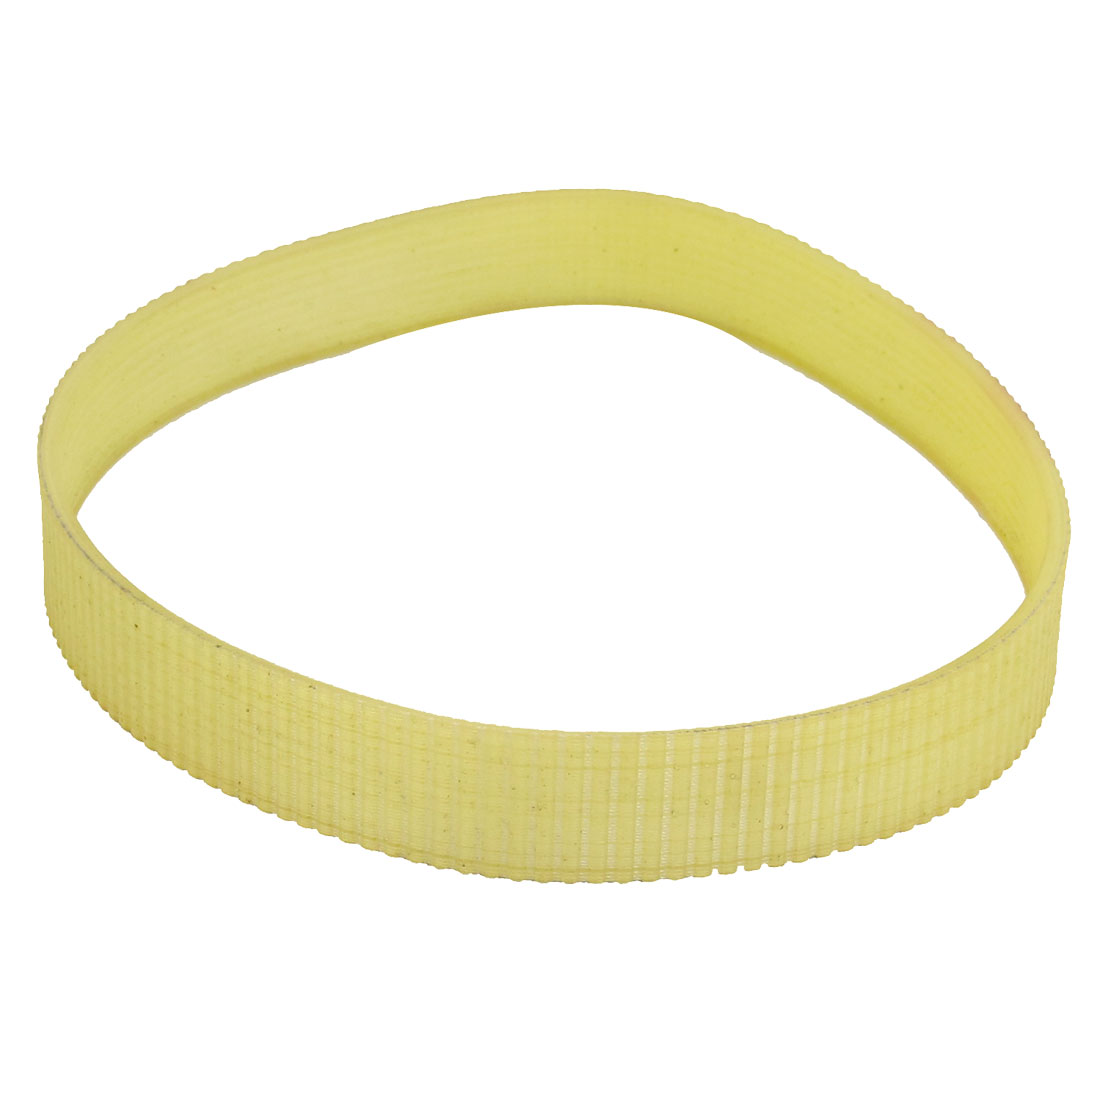 "23.6"" Beige Soft Plastic Repairing Component Cutting Machine Drive Belt"